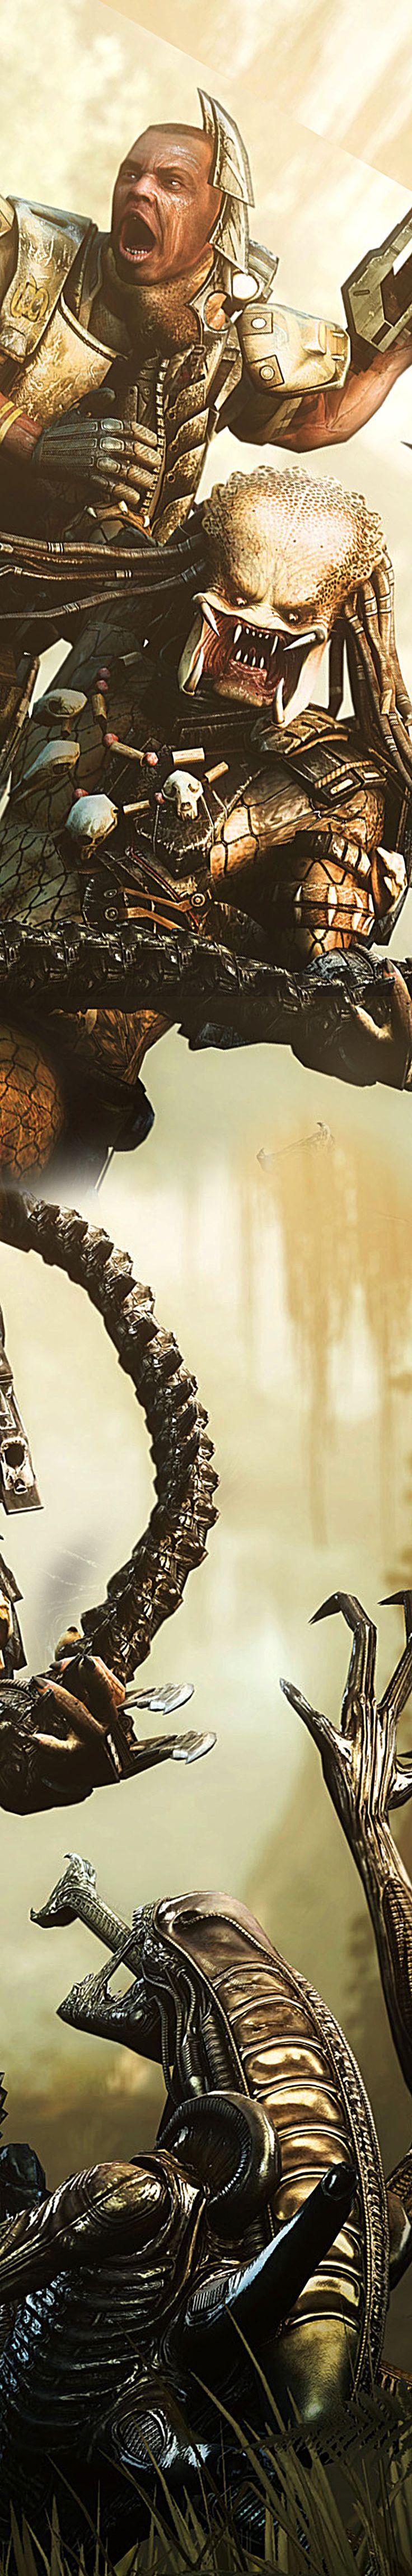 Marine v Predator v Alien